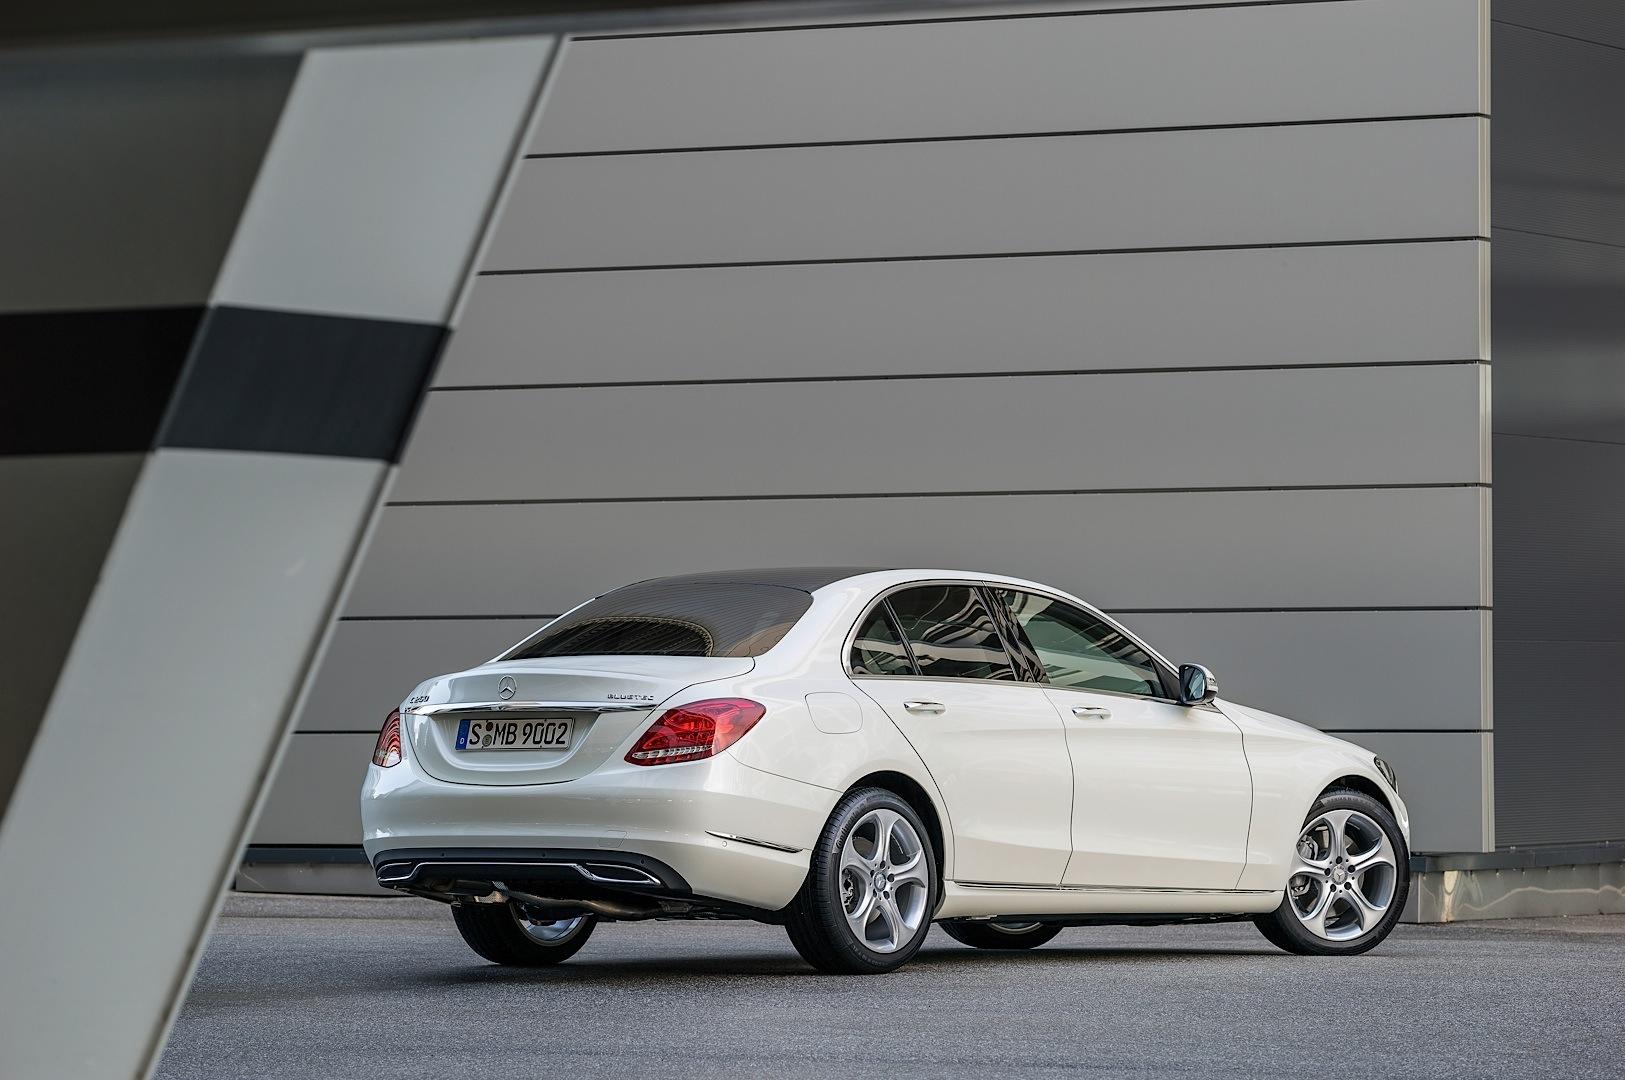 mb ca san sedan mercedes rafael for certified benz c awd used sale class